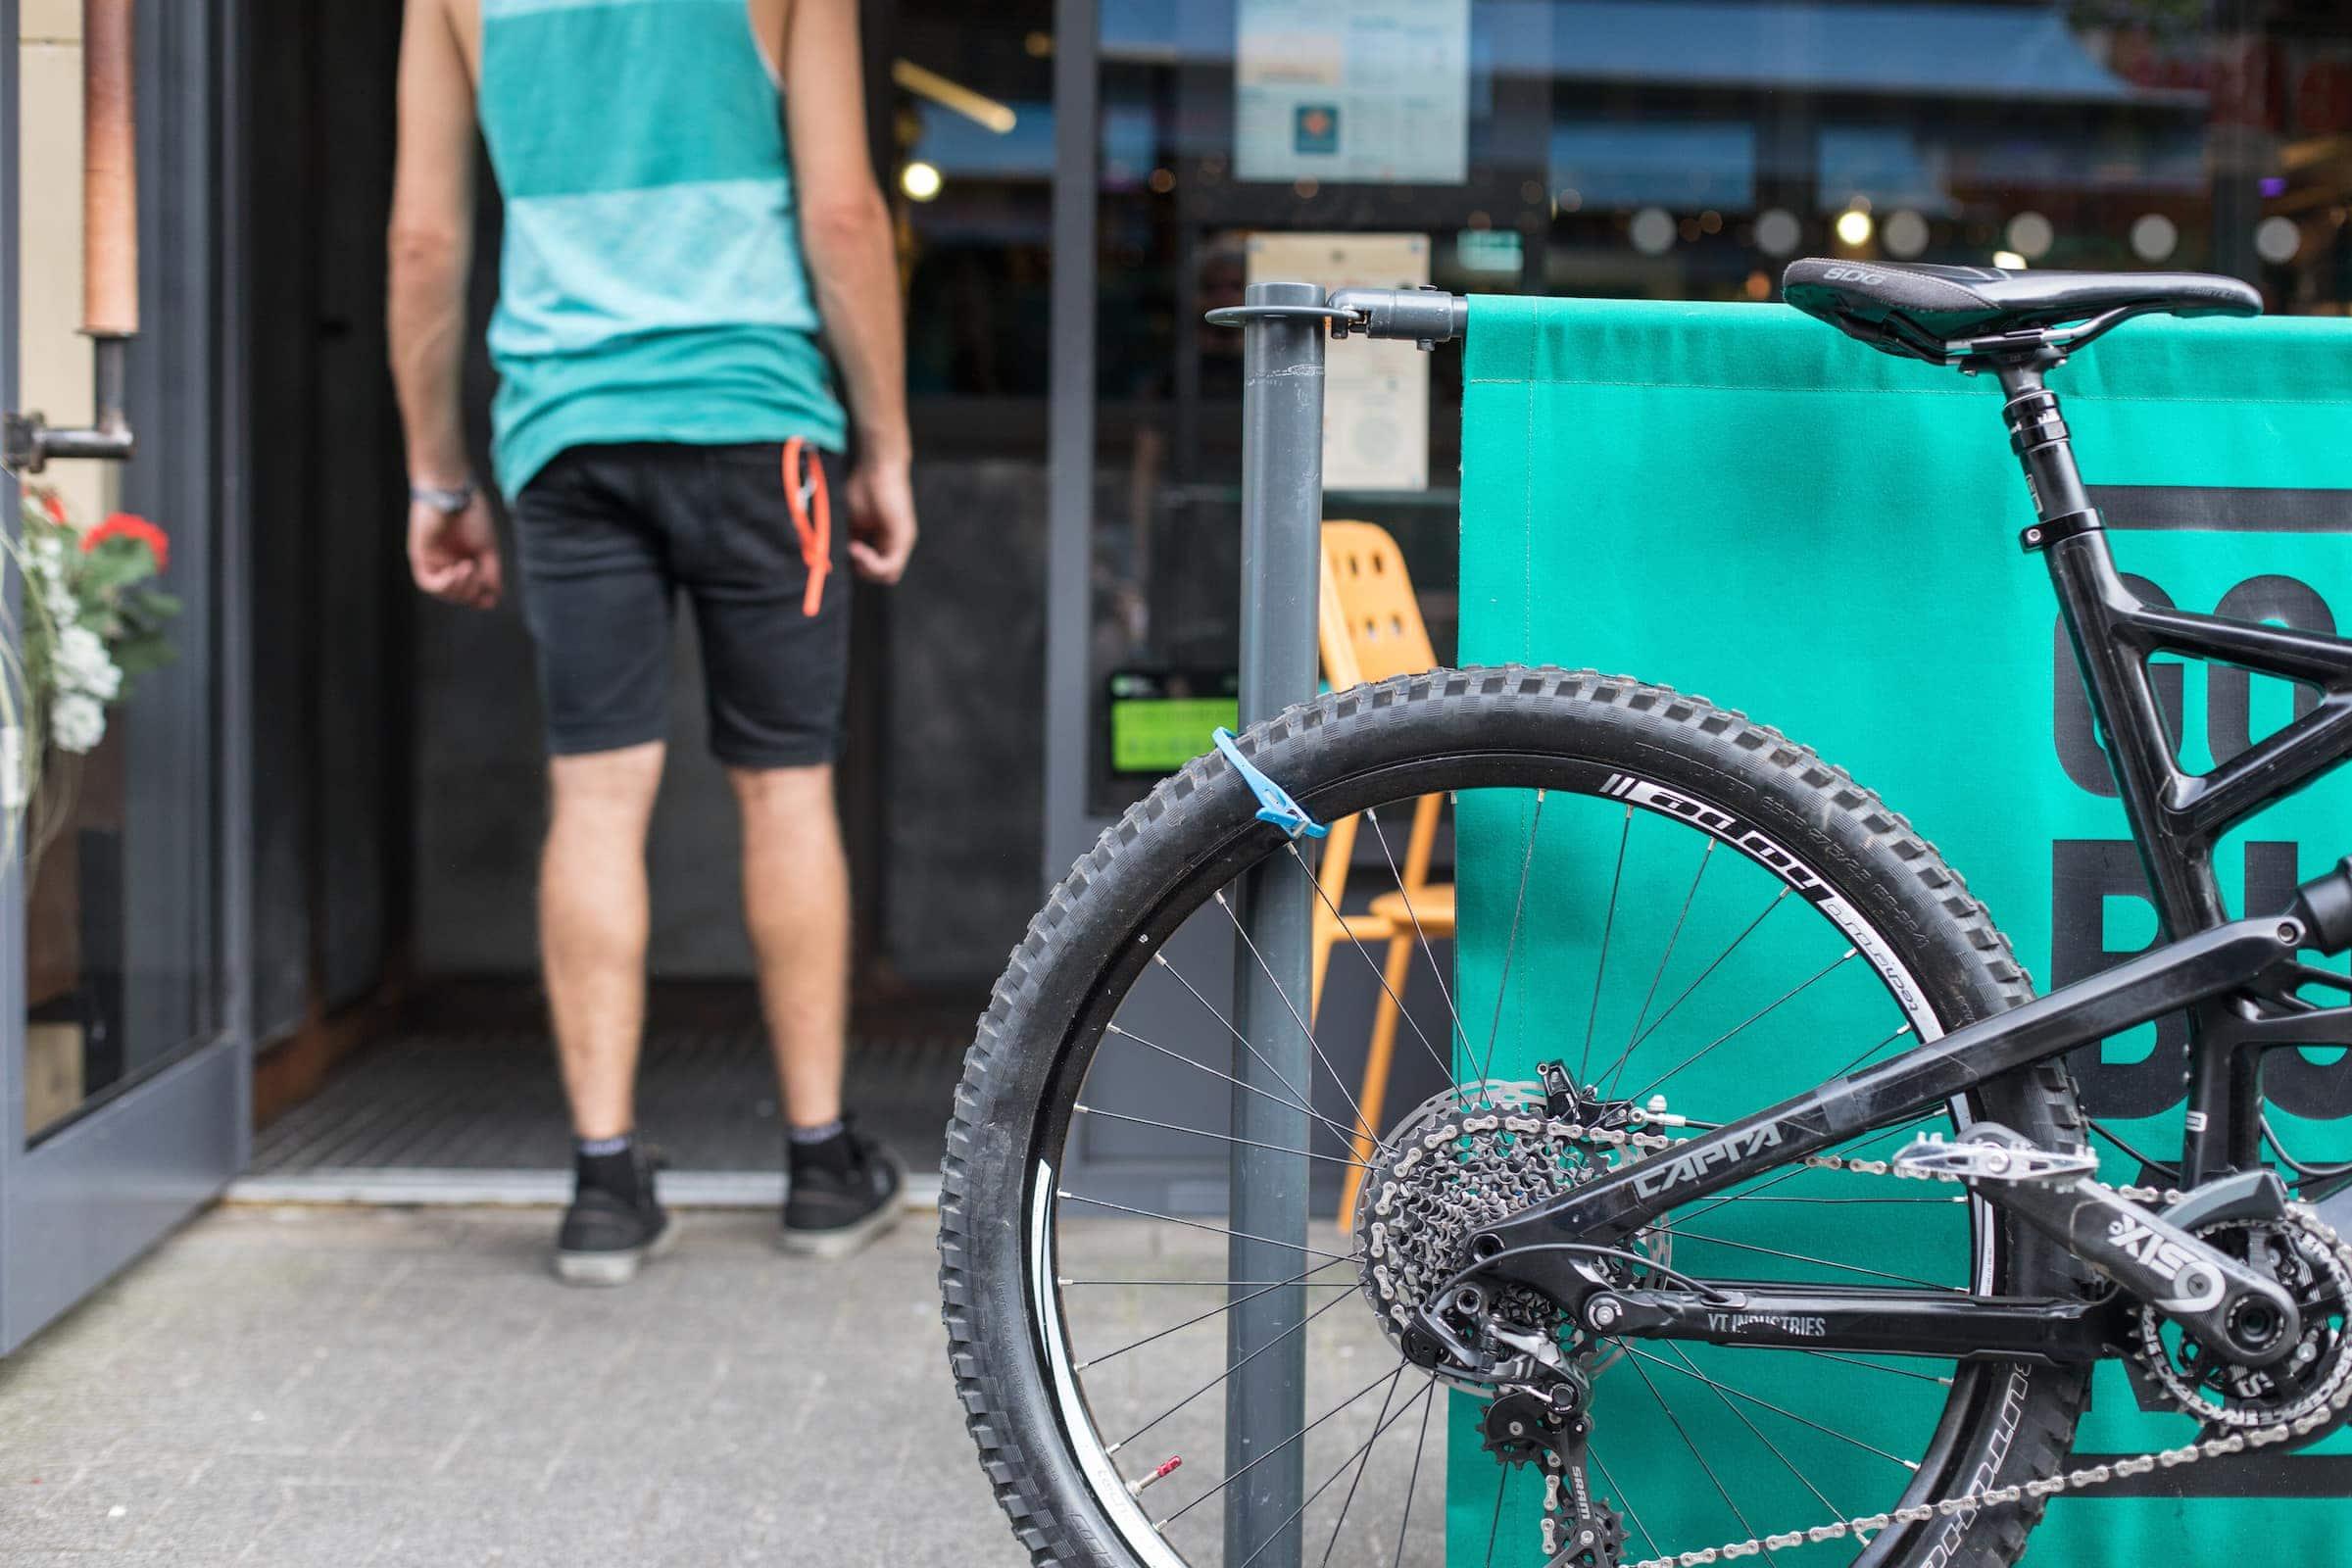 Hiplok Z LOK locking mtb bike